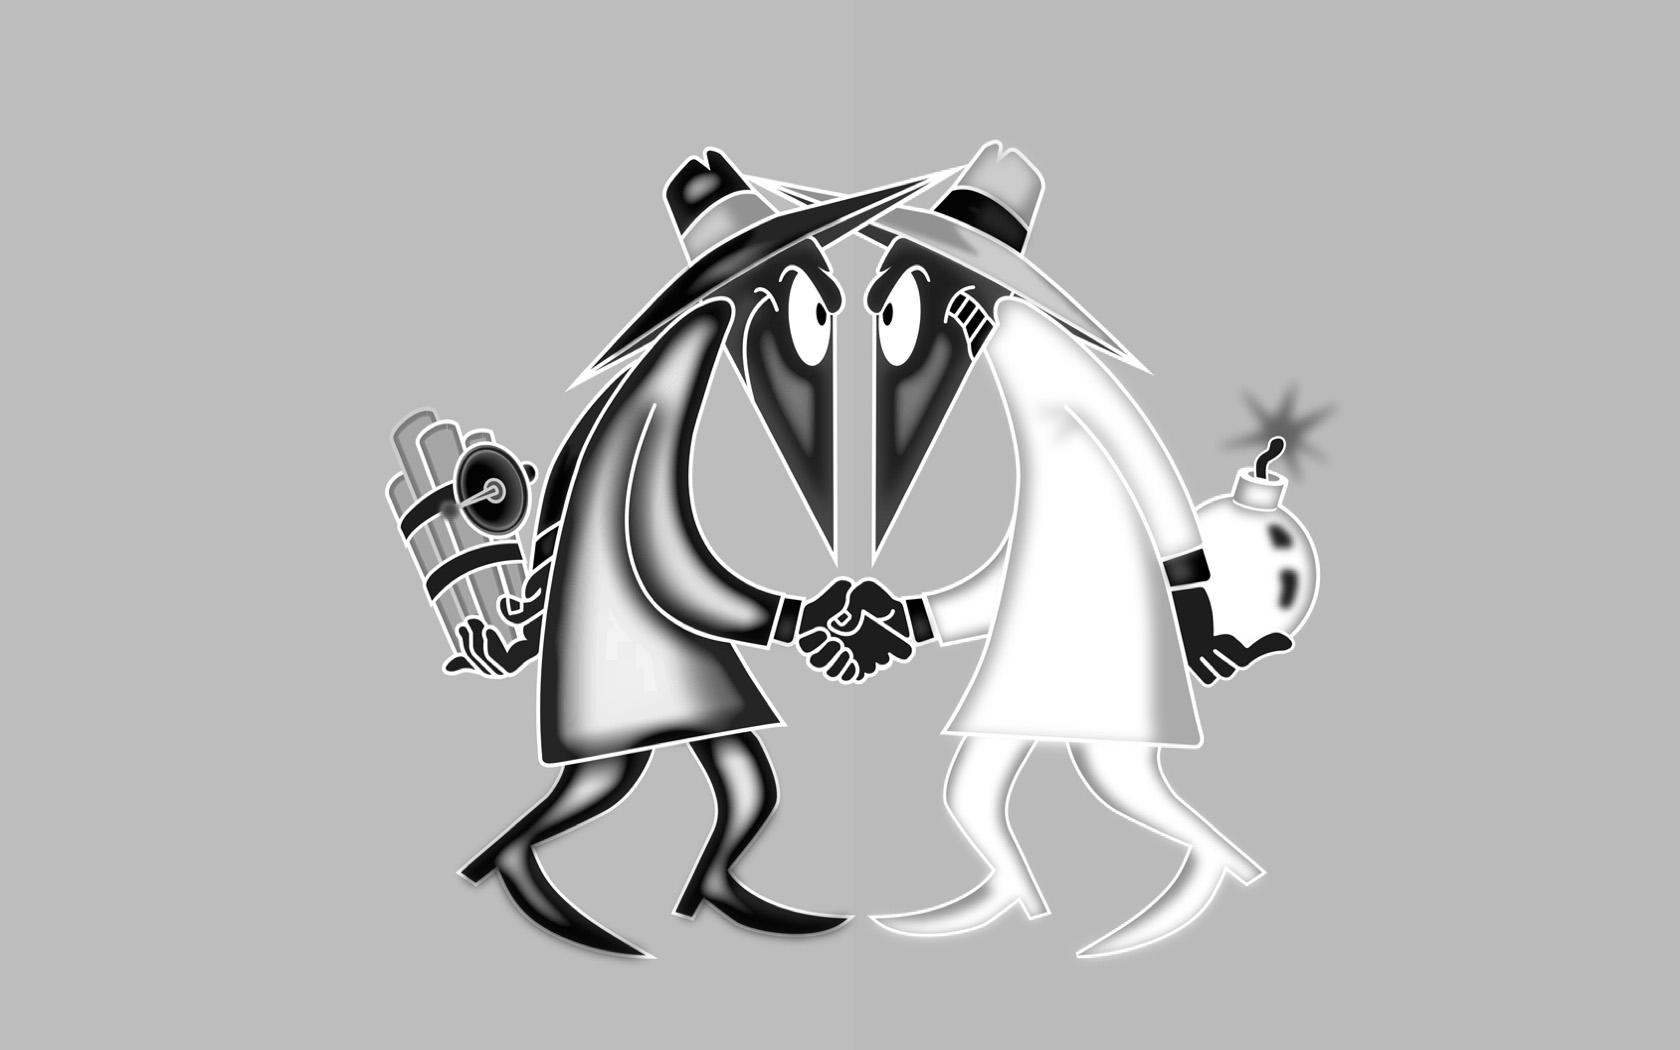 spy vs spy Computer Wallpapers Desktop Backgrounds 1680x1050 Id 1680x1050